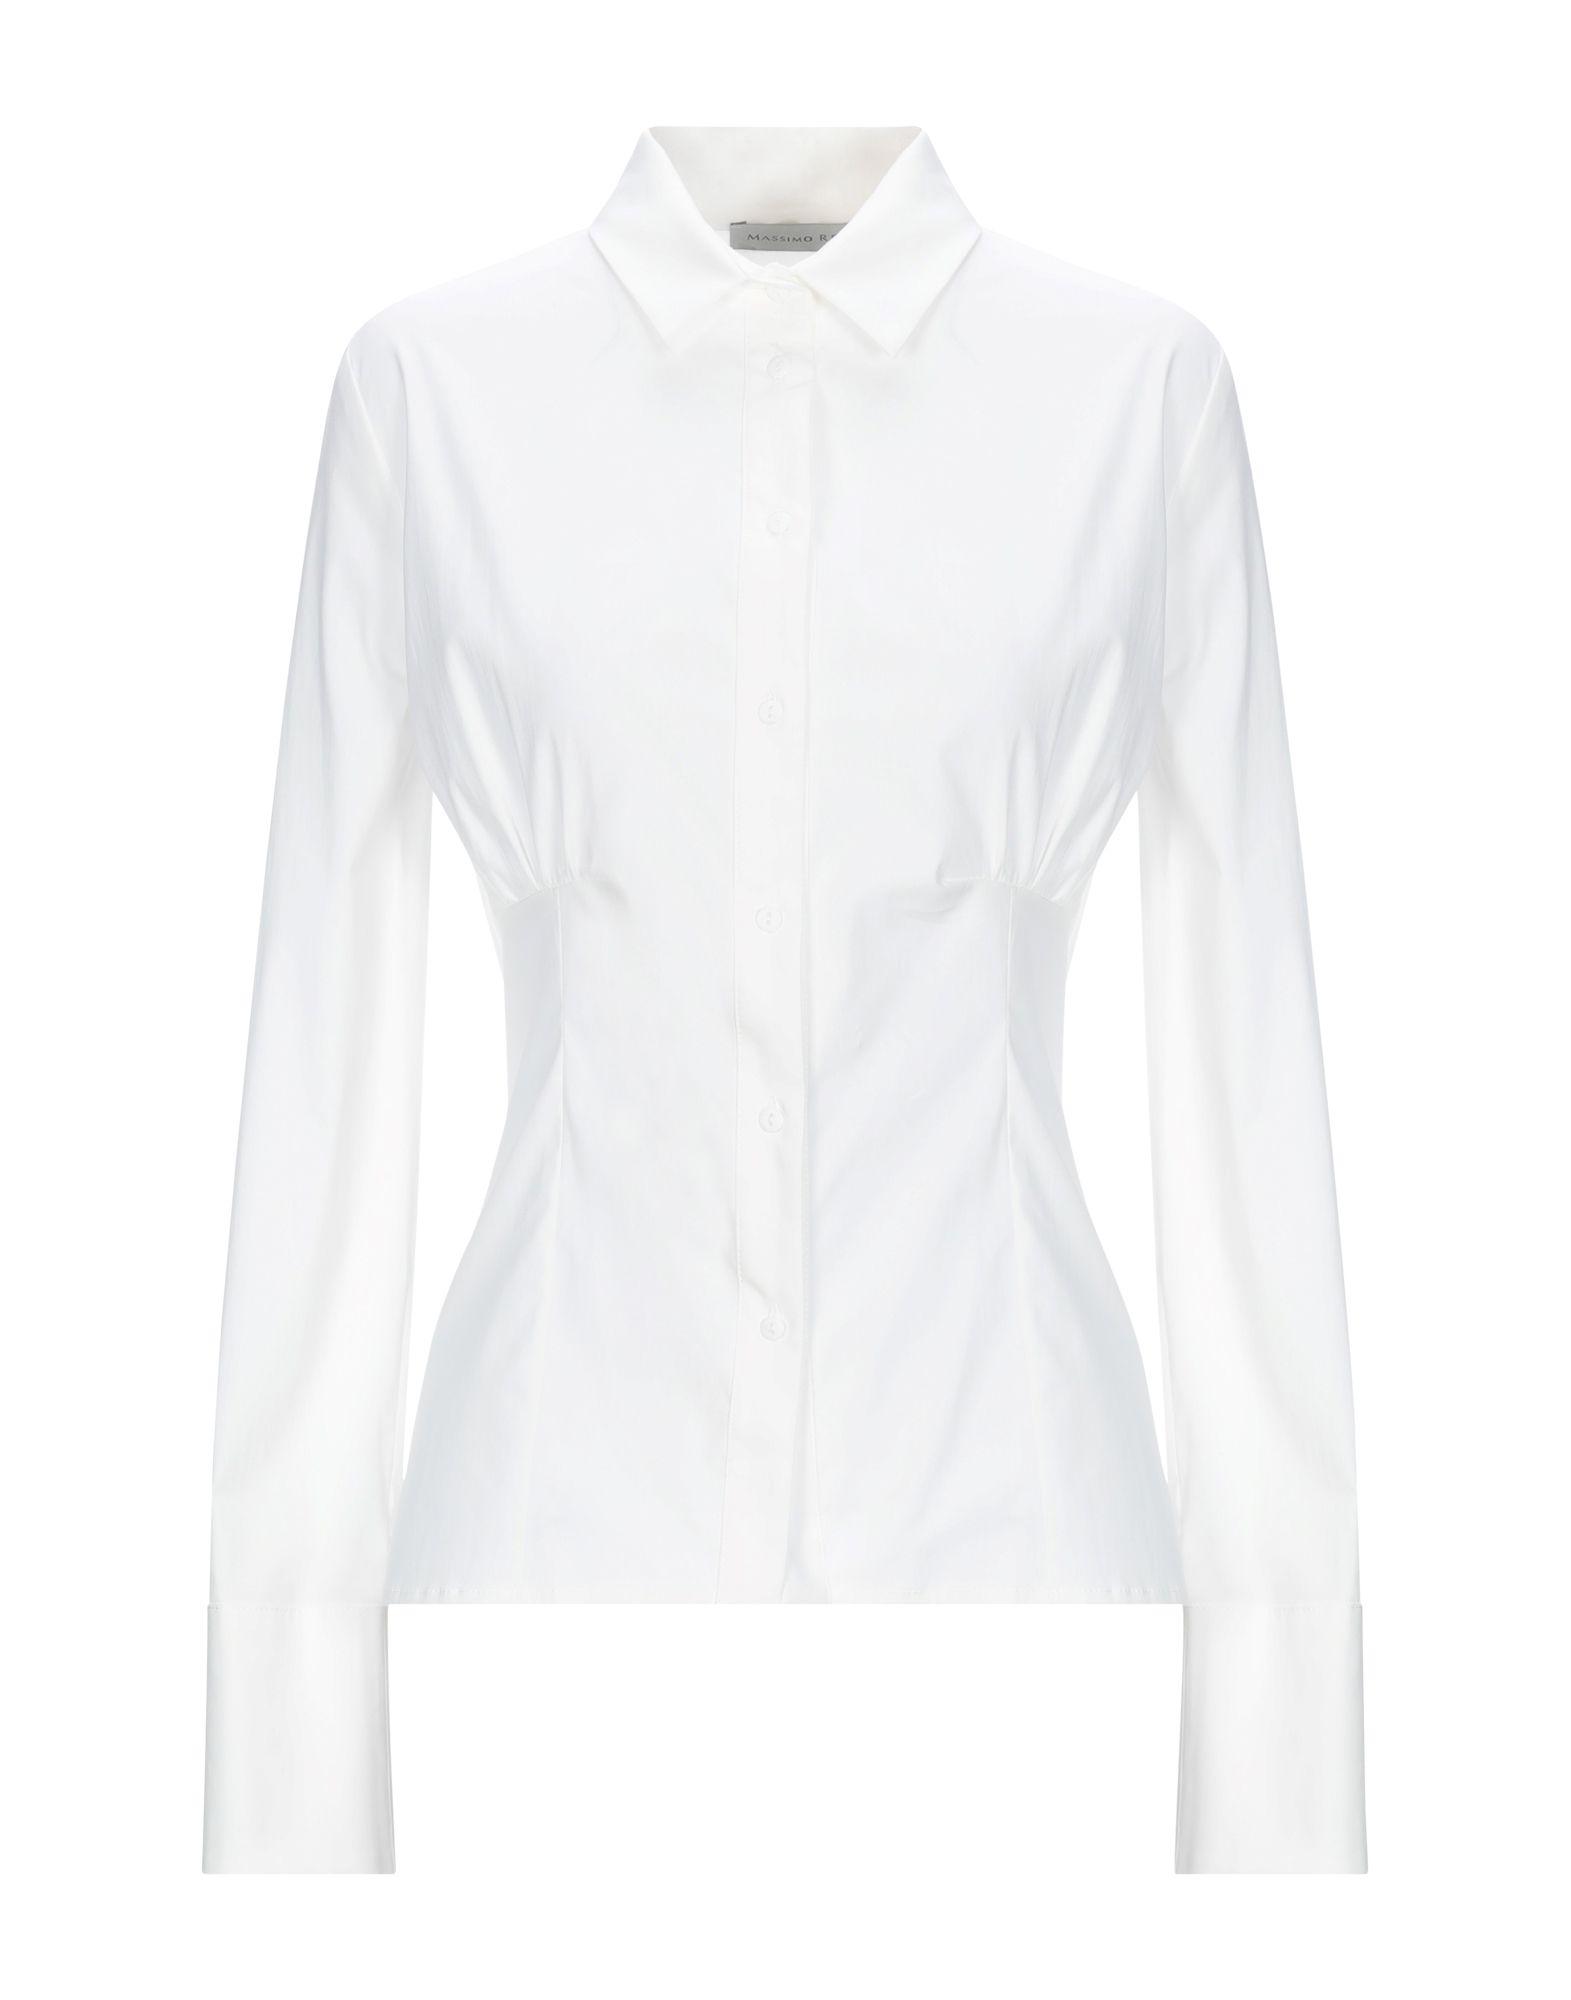 Camicie E bluse Tinta Unita Massimo Rebec  donna - - 38808799FD